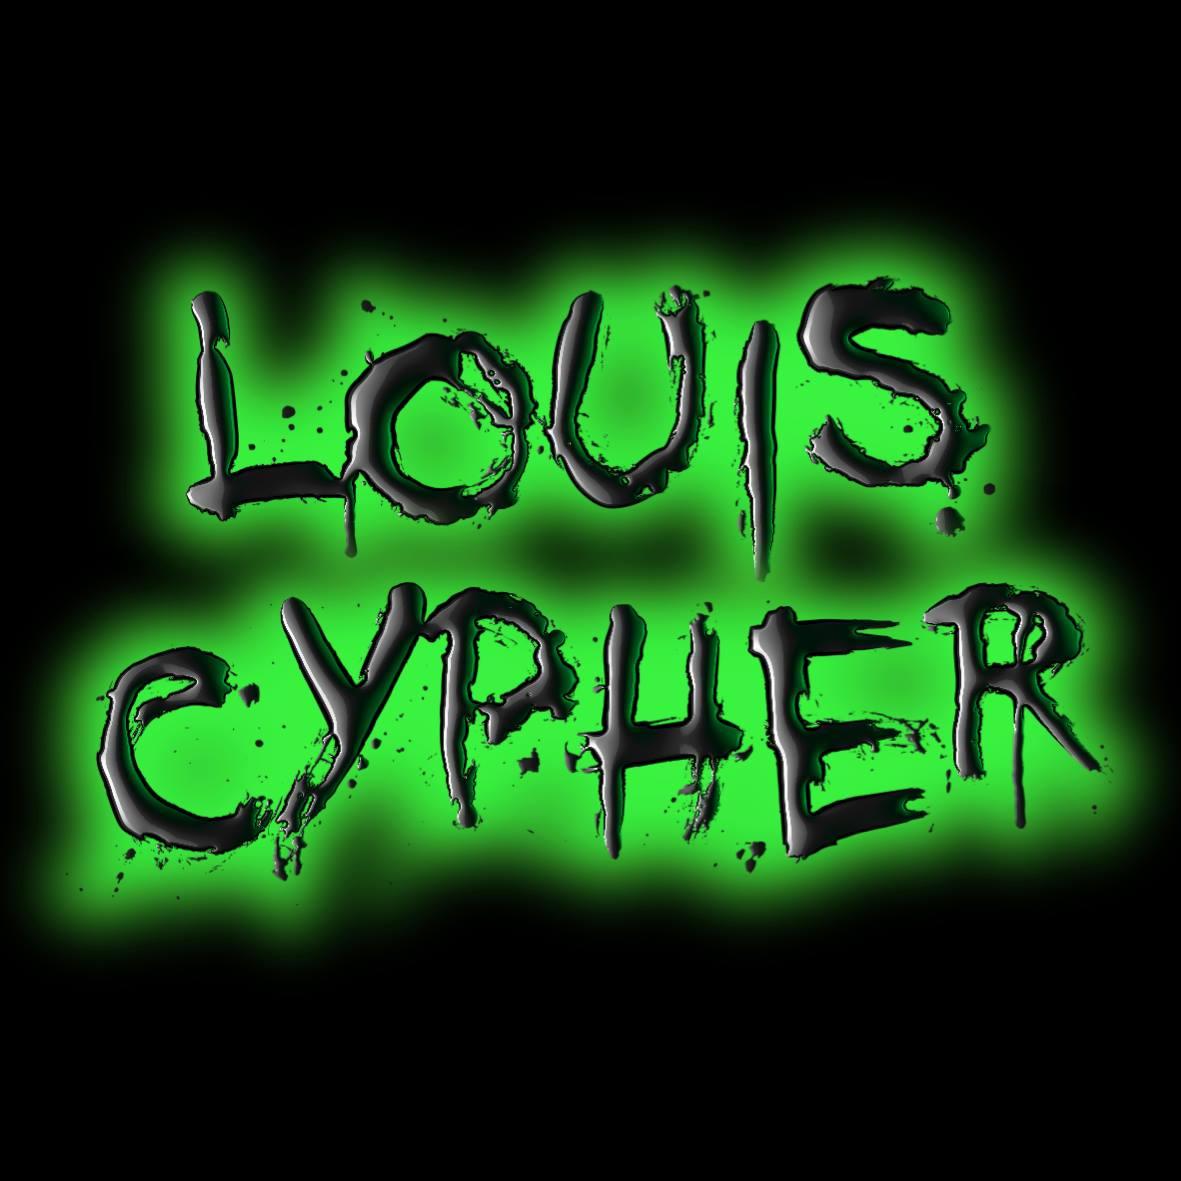 Louis Cypher